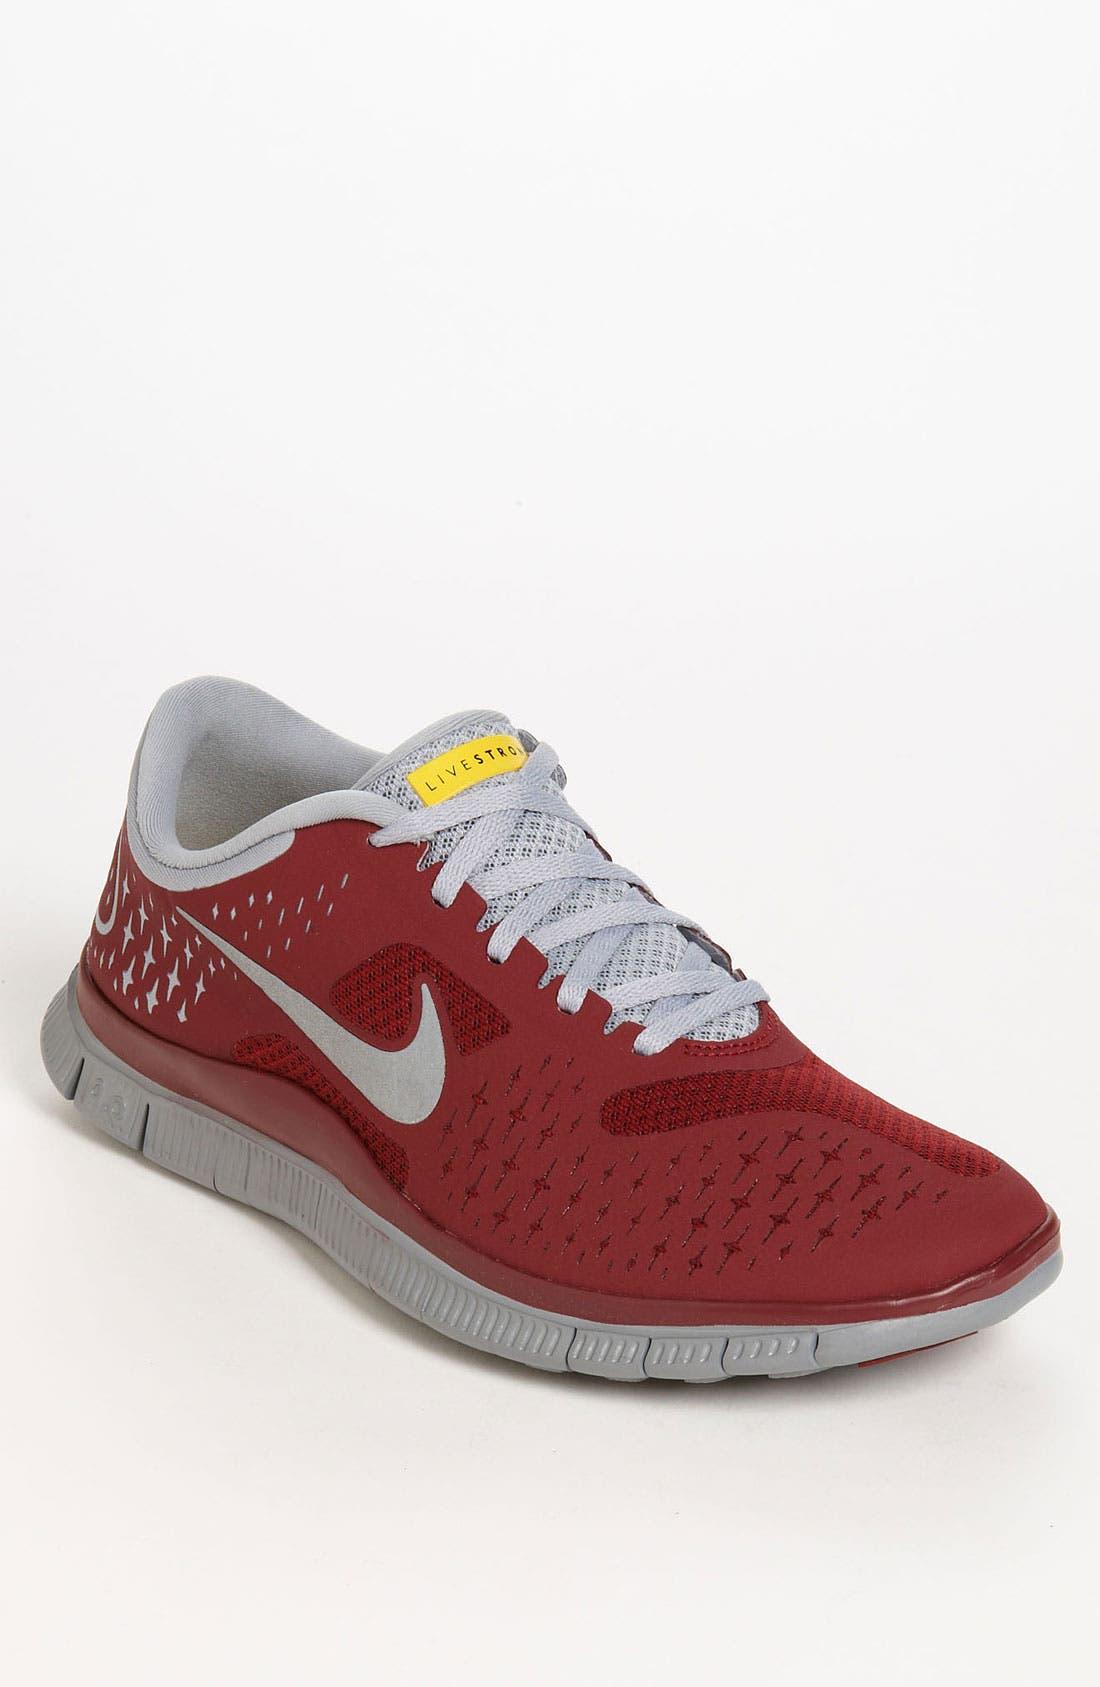 b1bfb07066 france mens nike free 4.0 v3 laf running shoes 53e17 f2ded